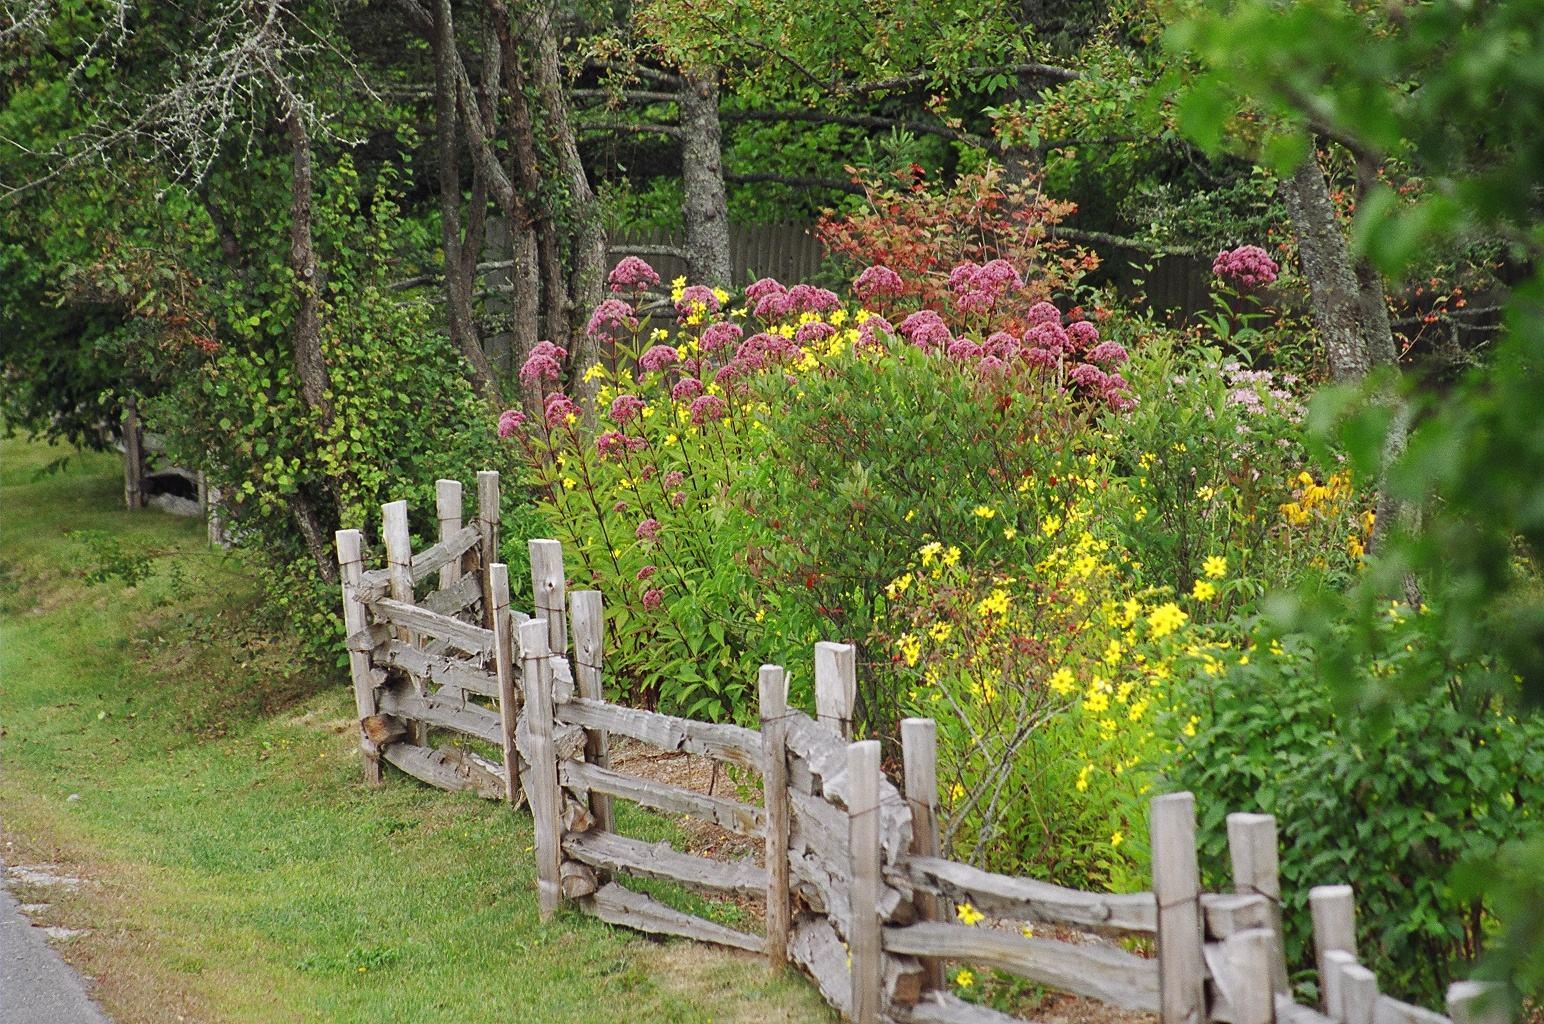 Cottage Gardens: Two Men And A Little Farm: INSPIRATION THURSDAY, FARM FENCE